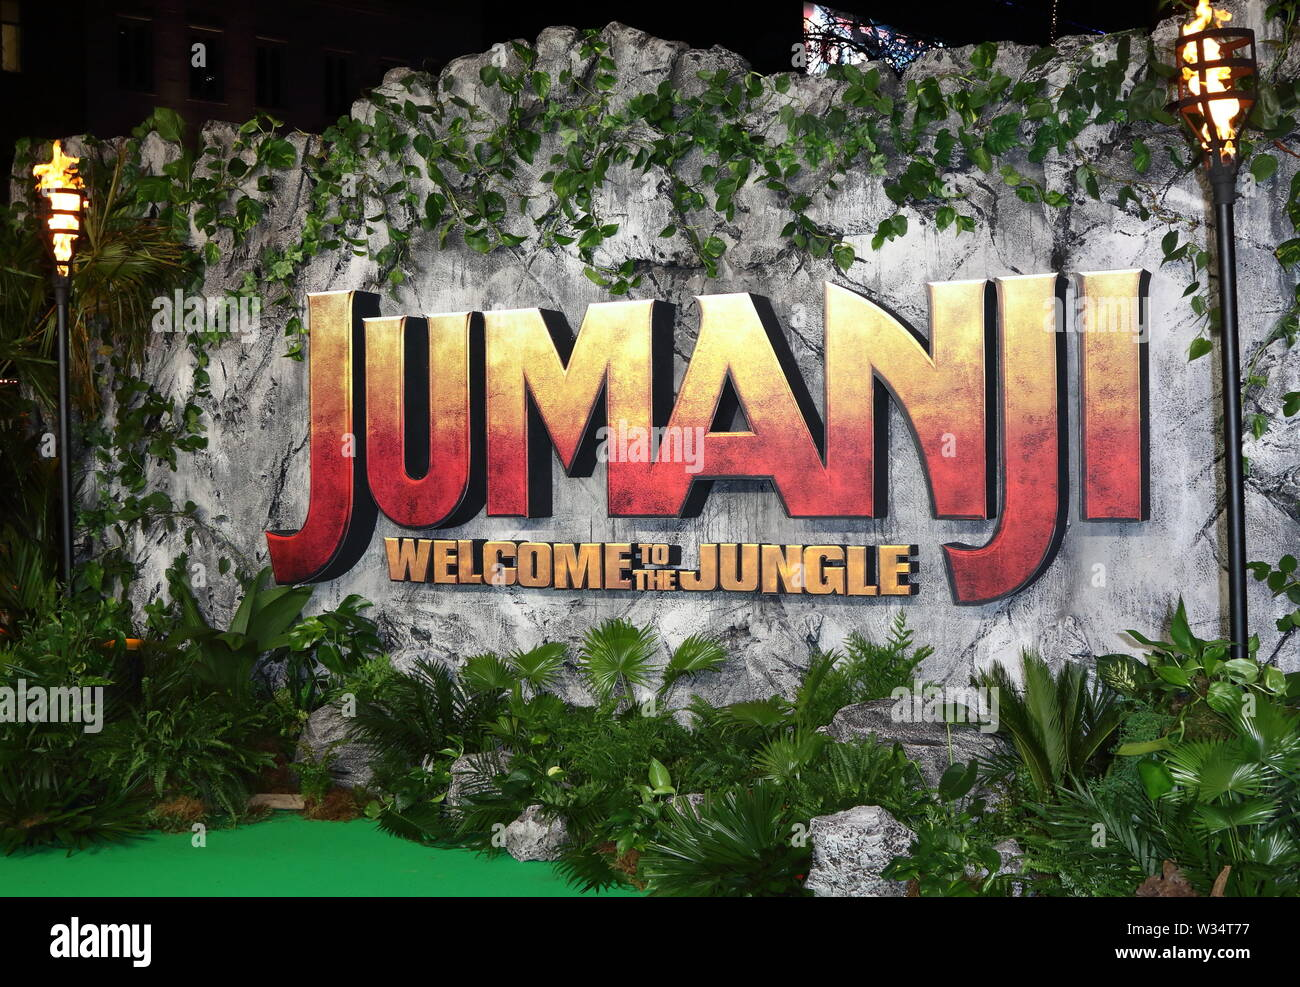 Jumanji Welcome To The Jungle Premiere Stock Photos